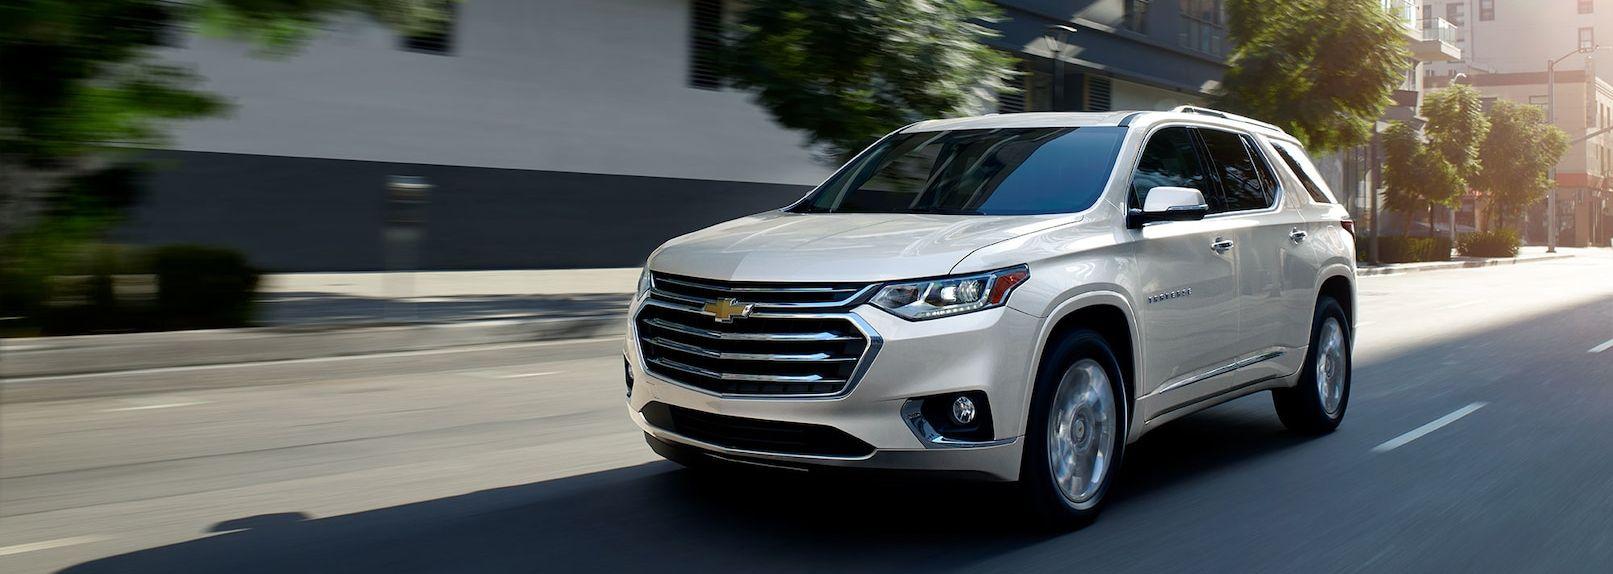 2019 Chevrolet Traverse for Sale near Lapeer, MI